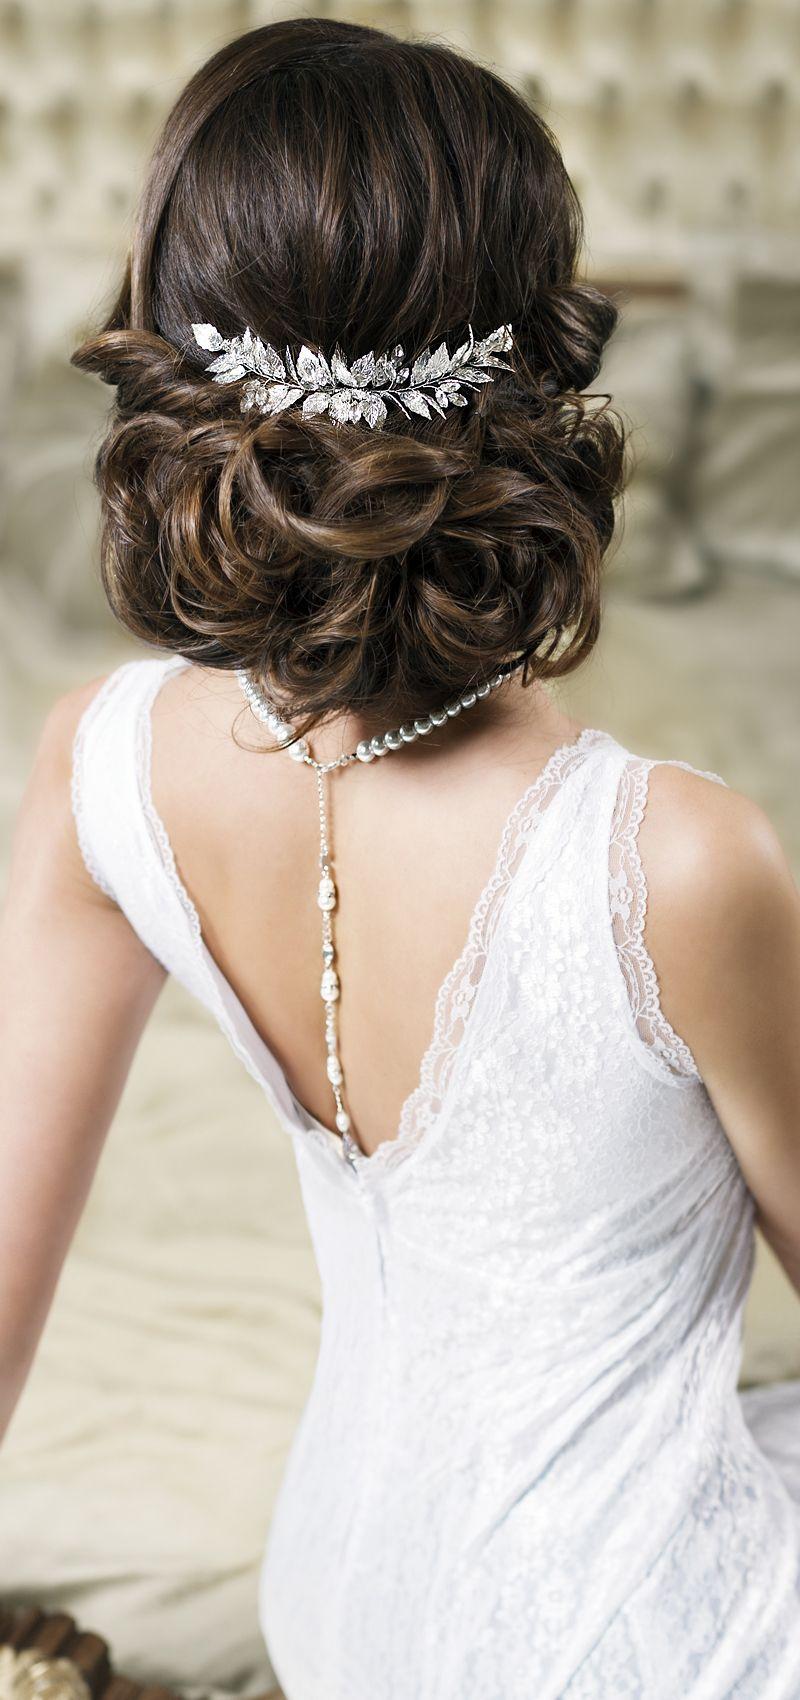 Bridal hair comb peinados de novia pinterest cabello - Peinados recogidos novias ...